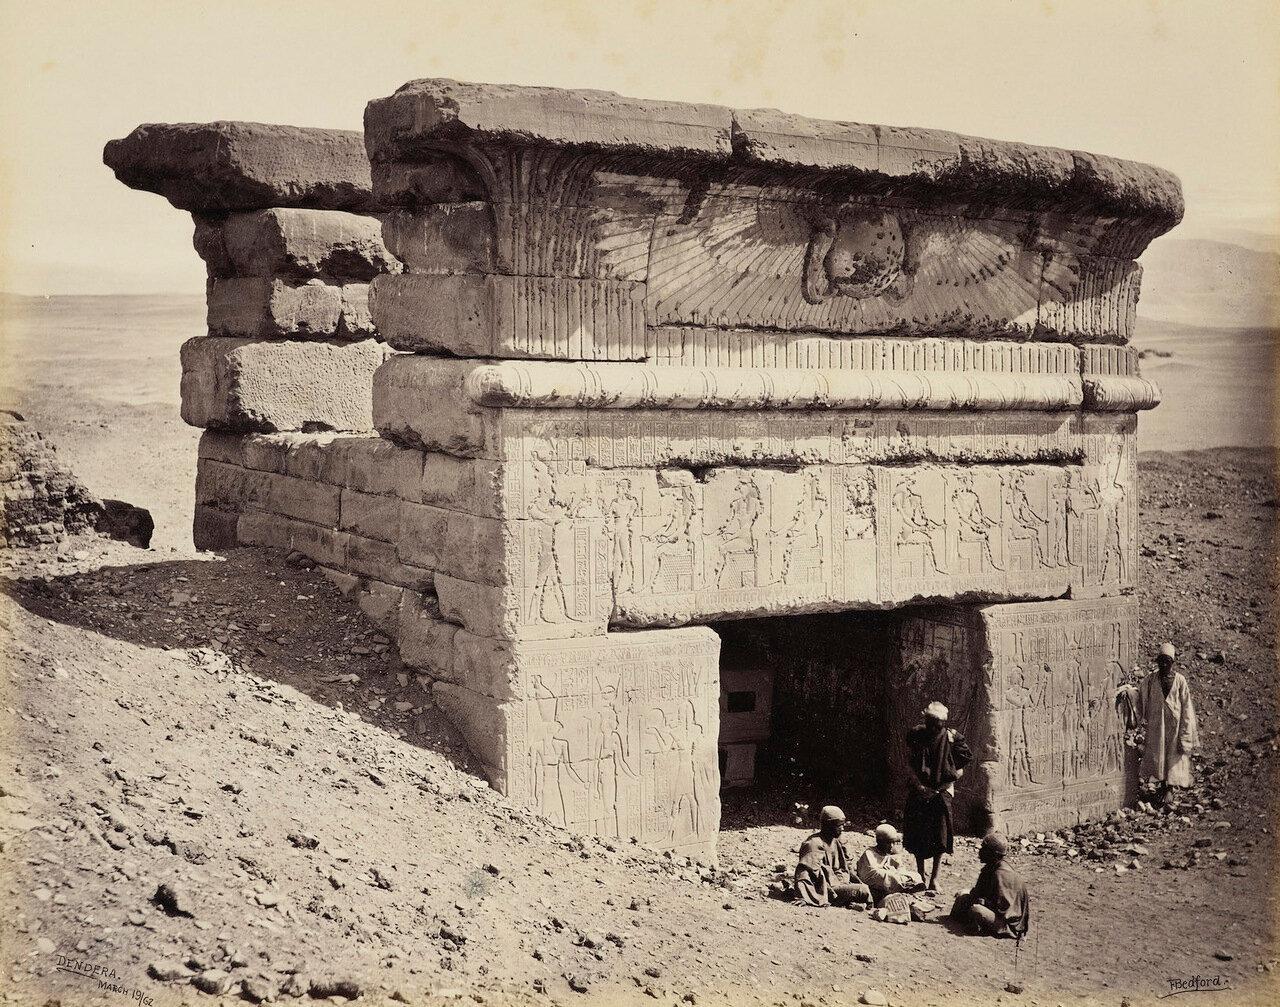 19 марта 1862. Ворота храма в Дендере. Храм Хатхор